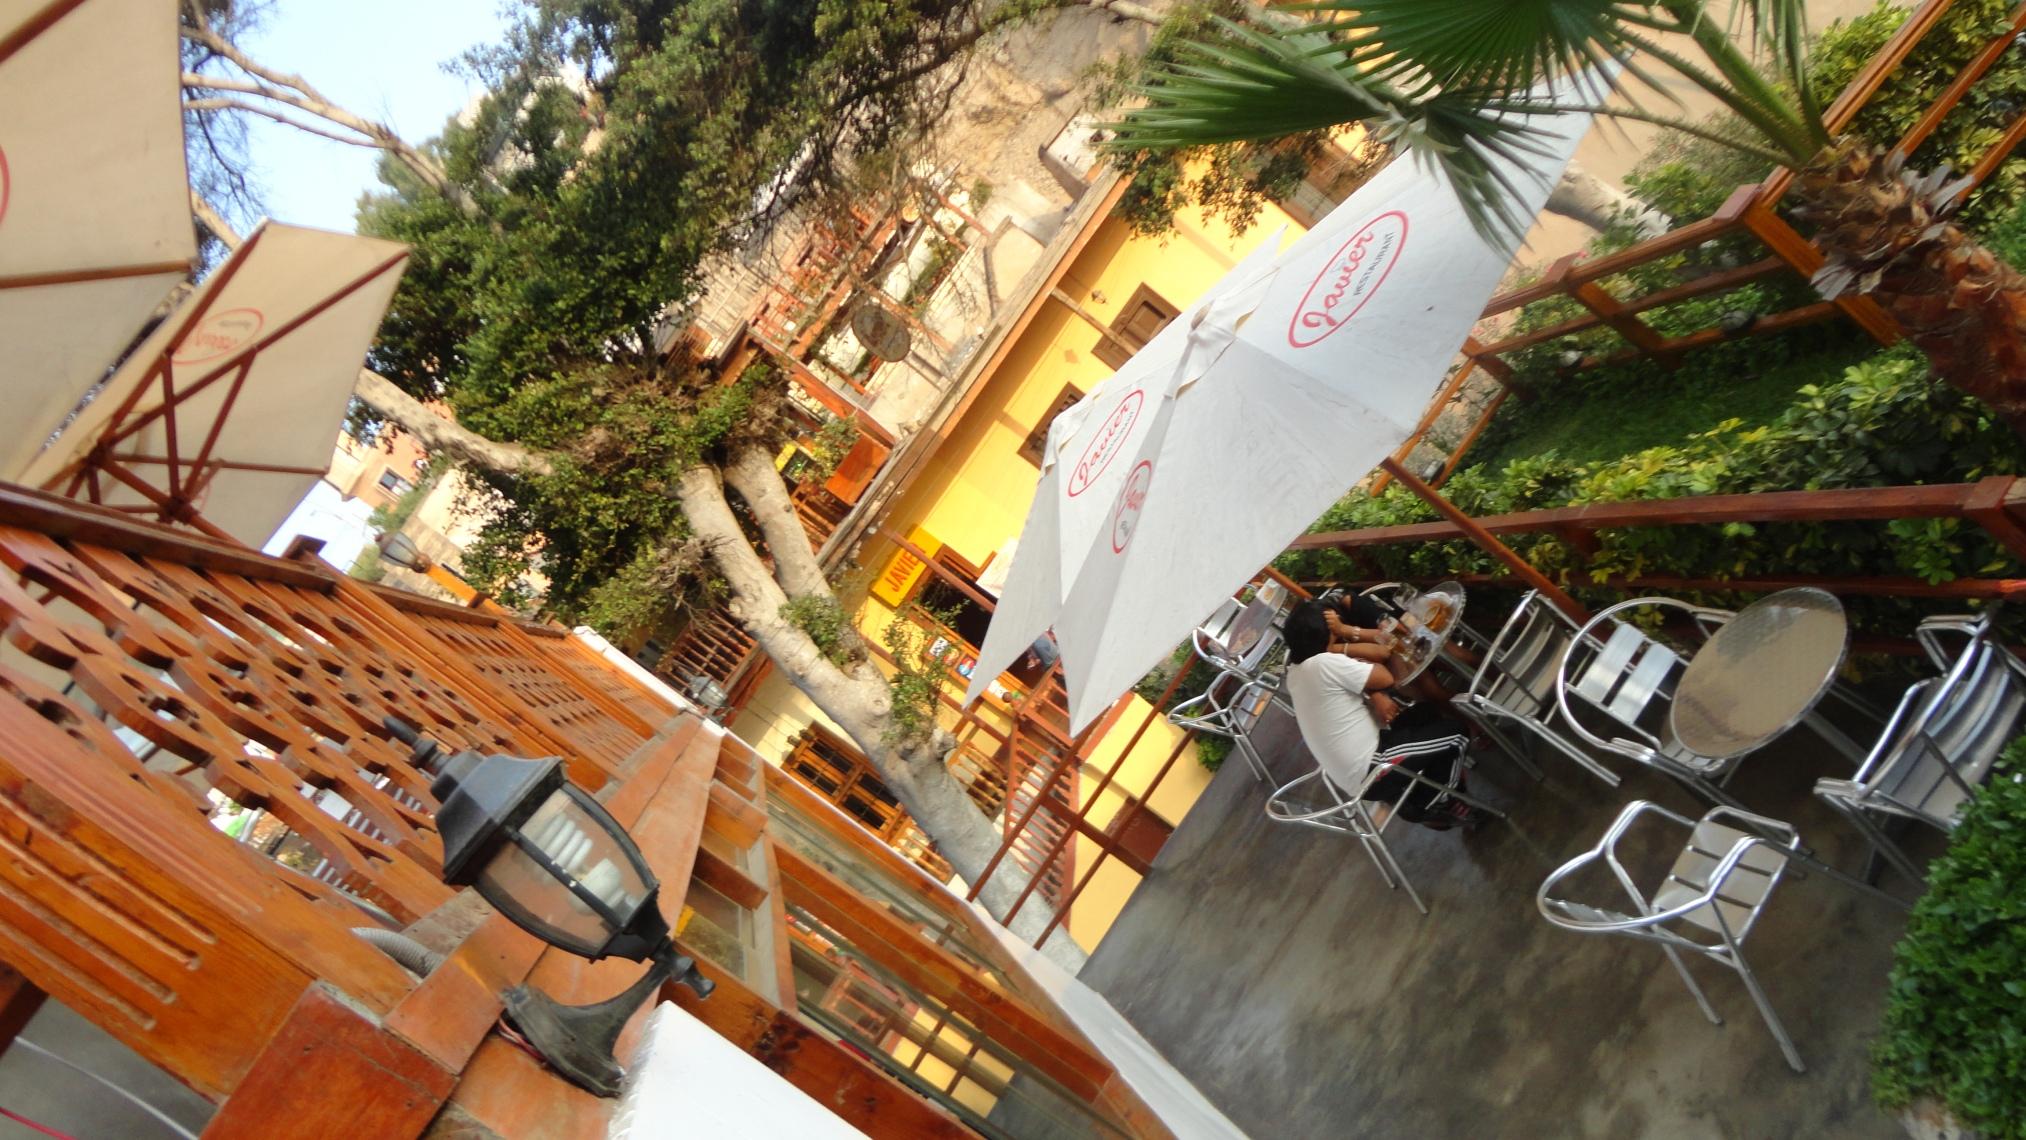 Cafe in Barranco